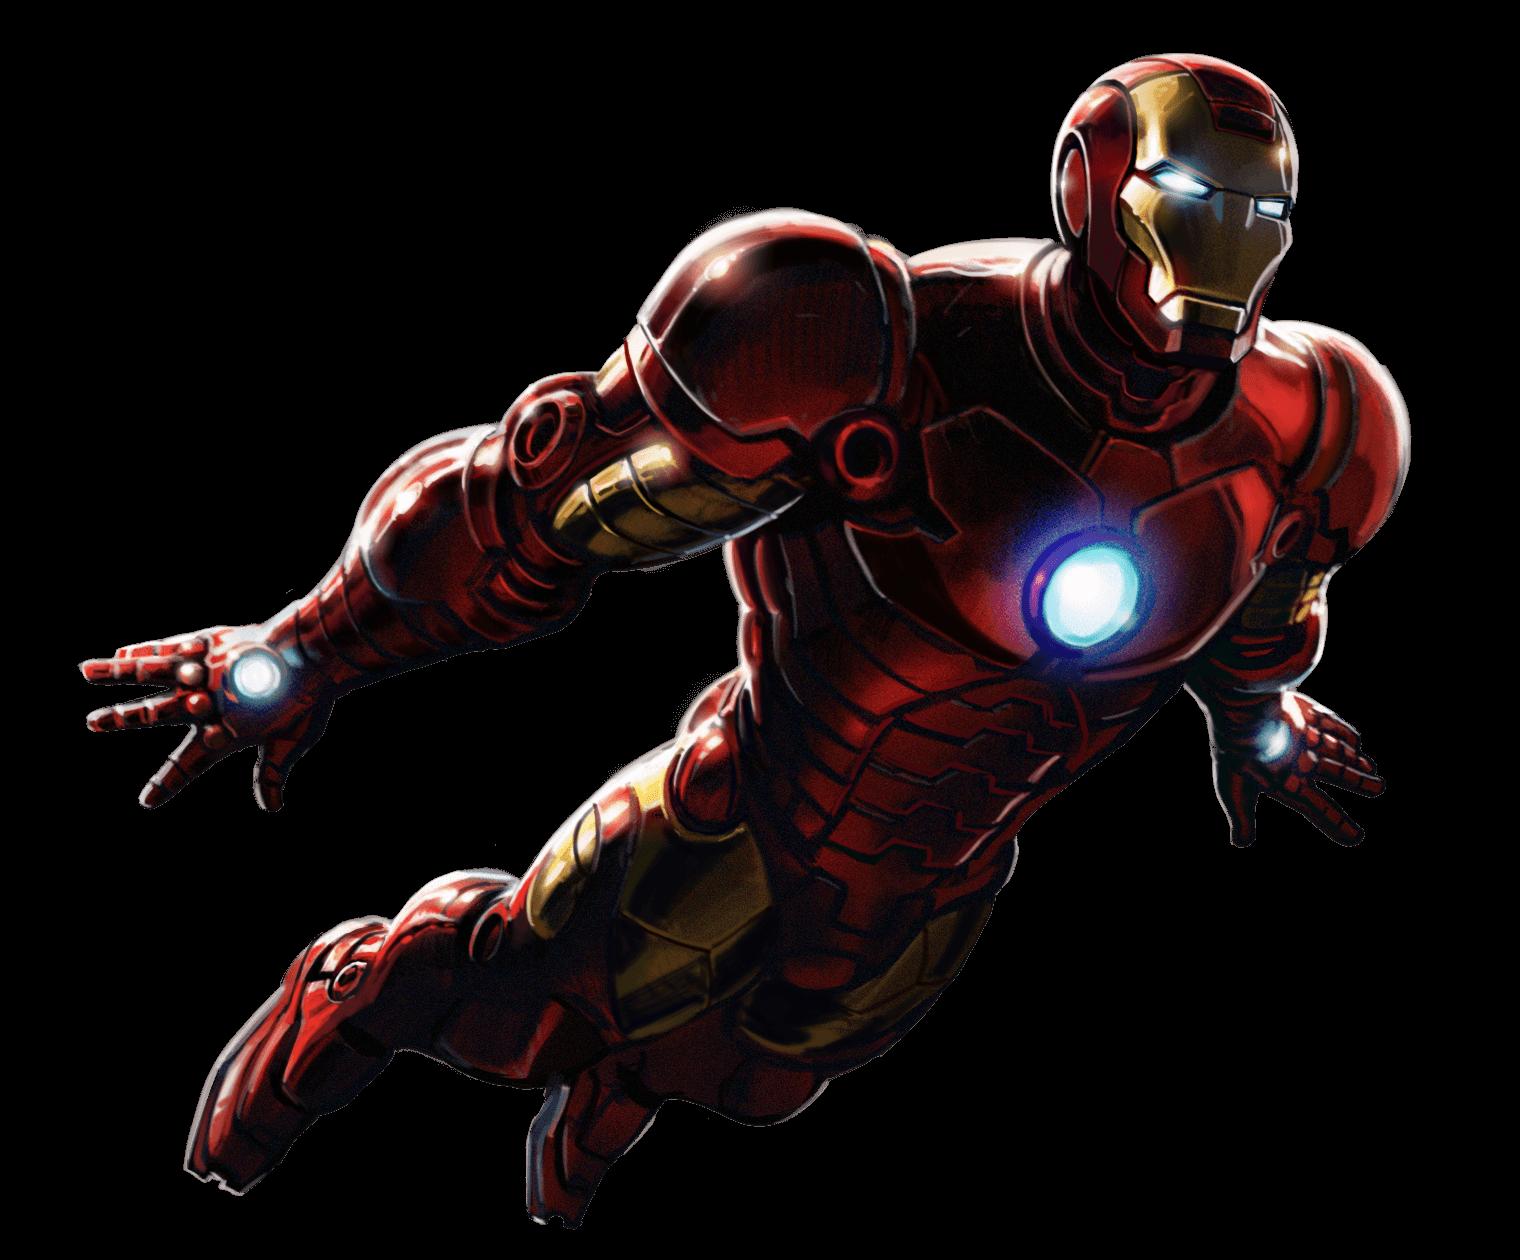 Iron Man Flying Up - Iron Man PNG HD